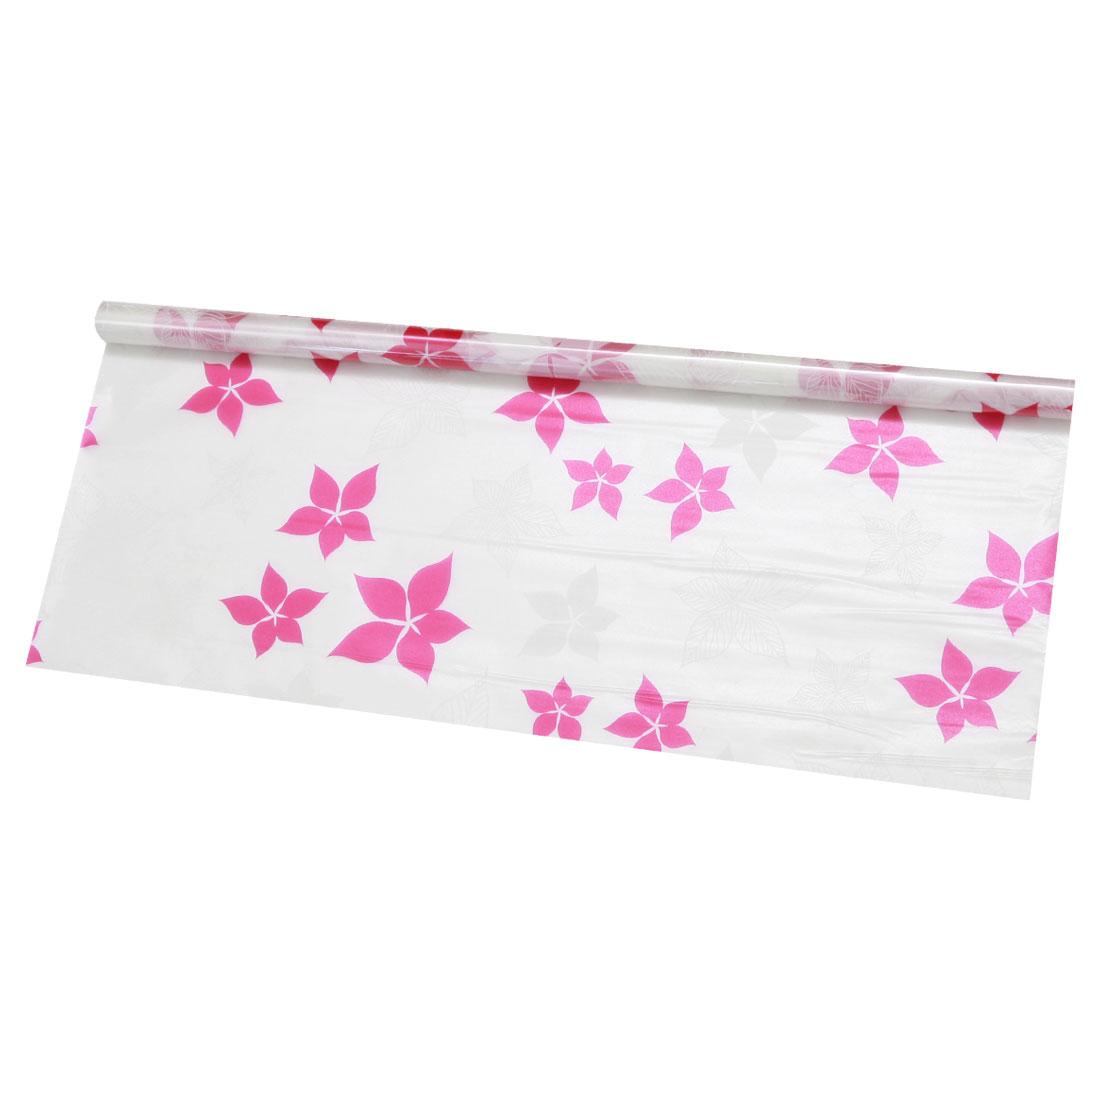 "Self-sticky 23.6"" x 78.7"" Water Resistant Window Film Pomegranate Flower Pattern"